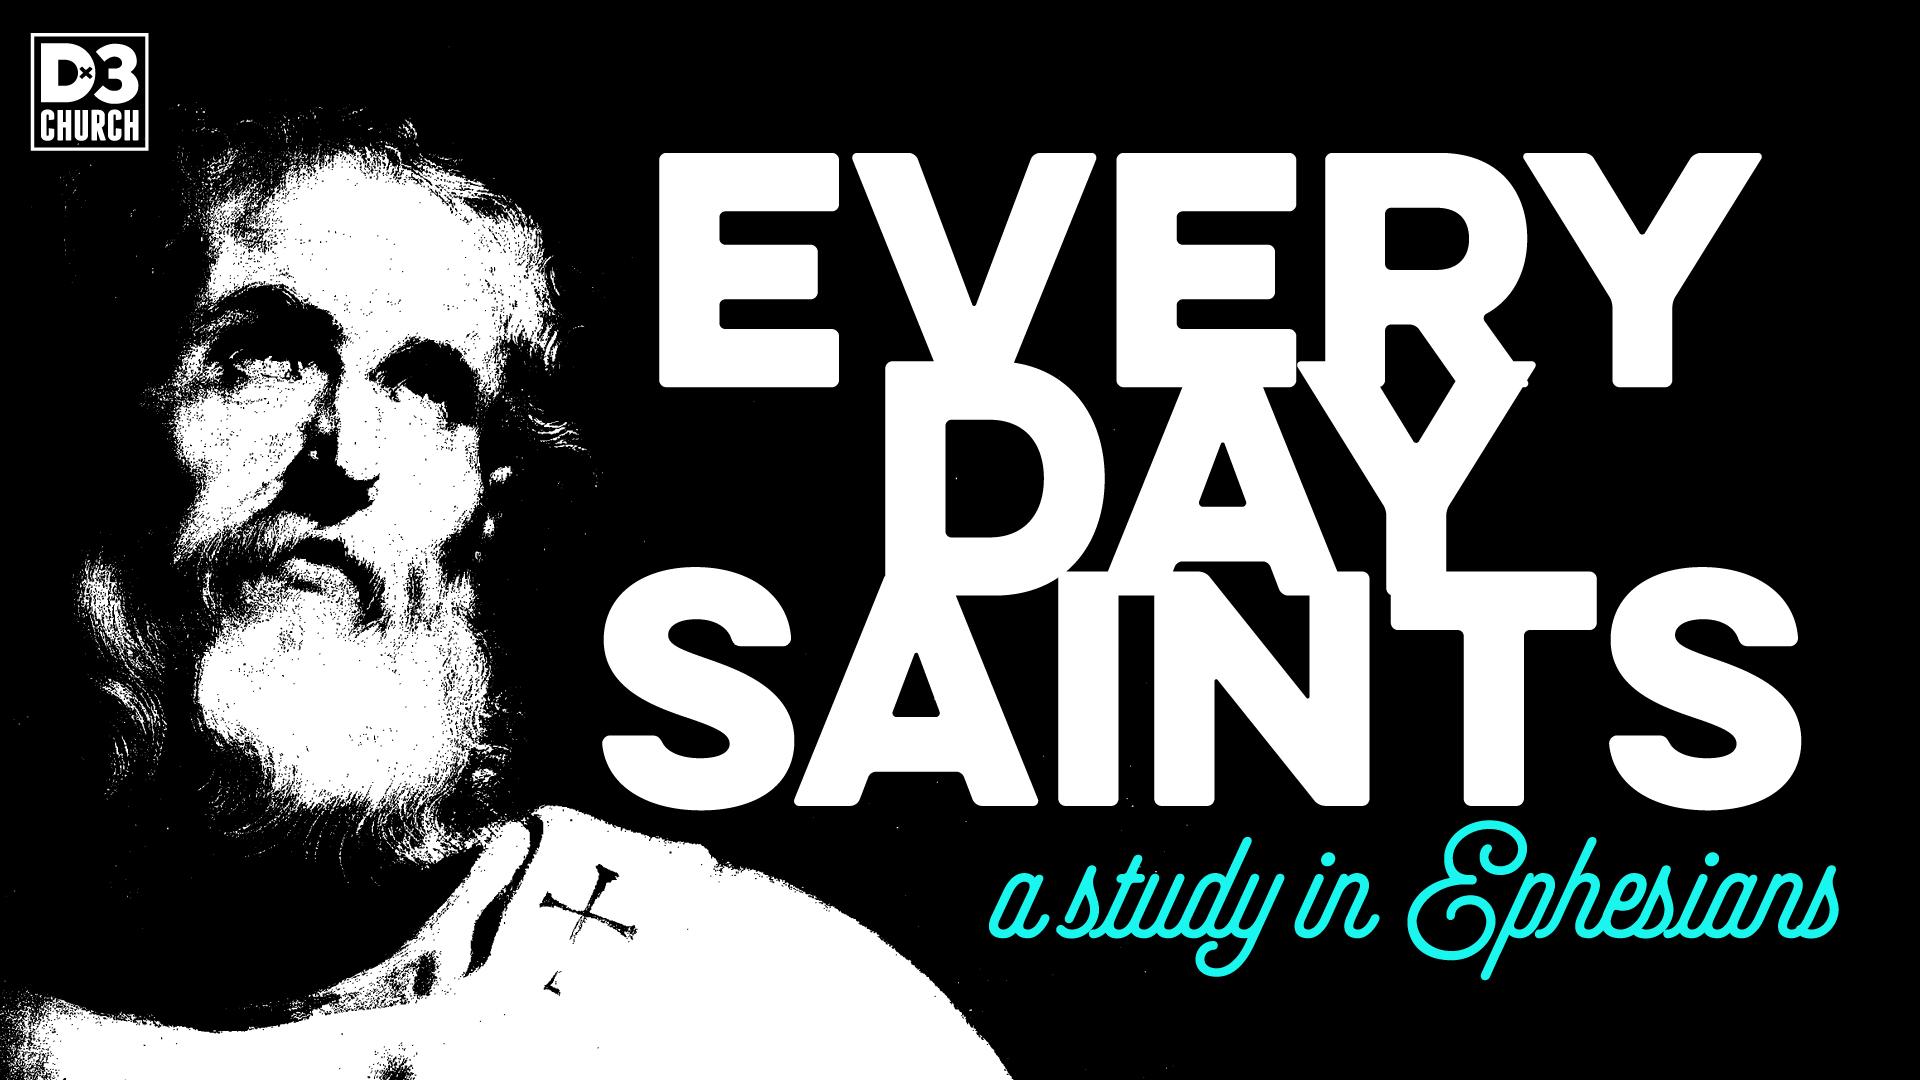 Everyday Saints.jpg